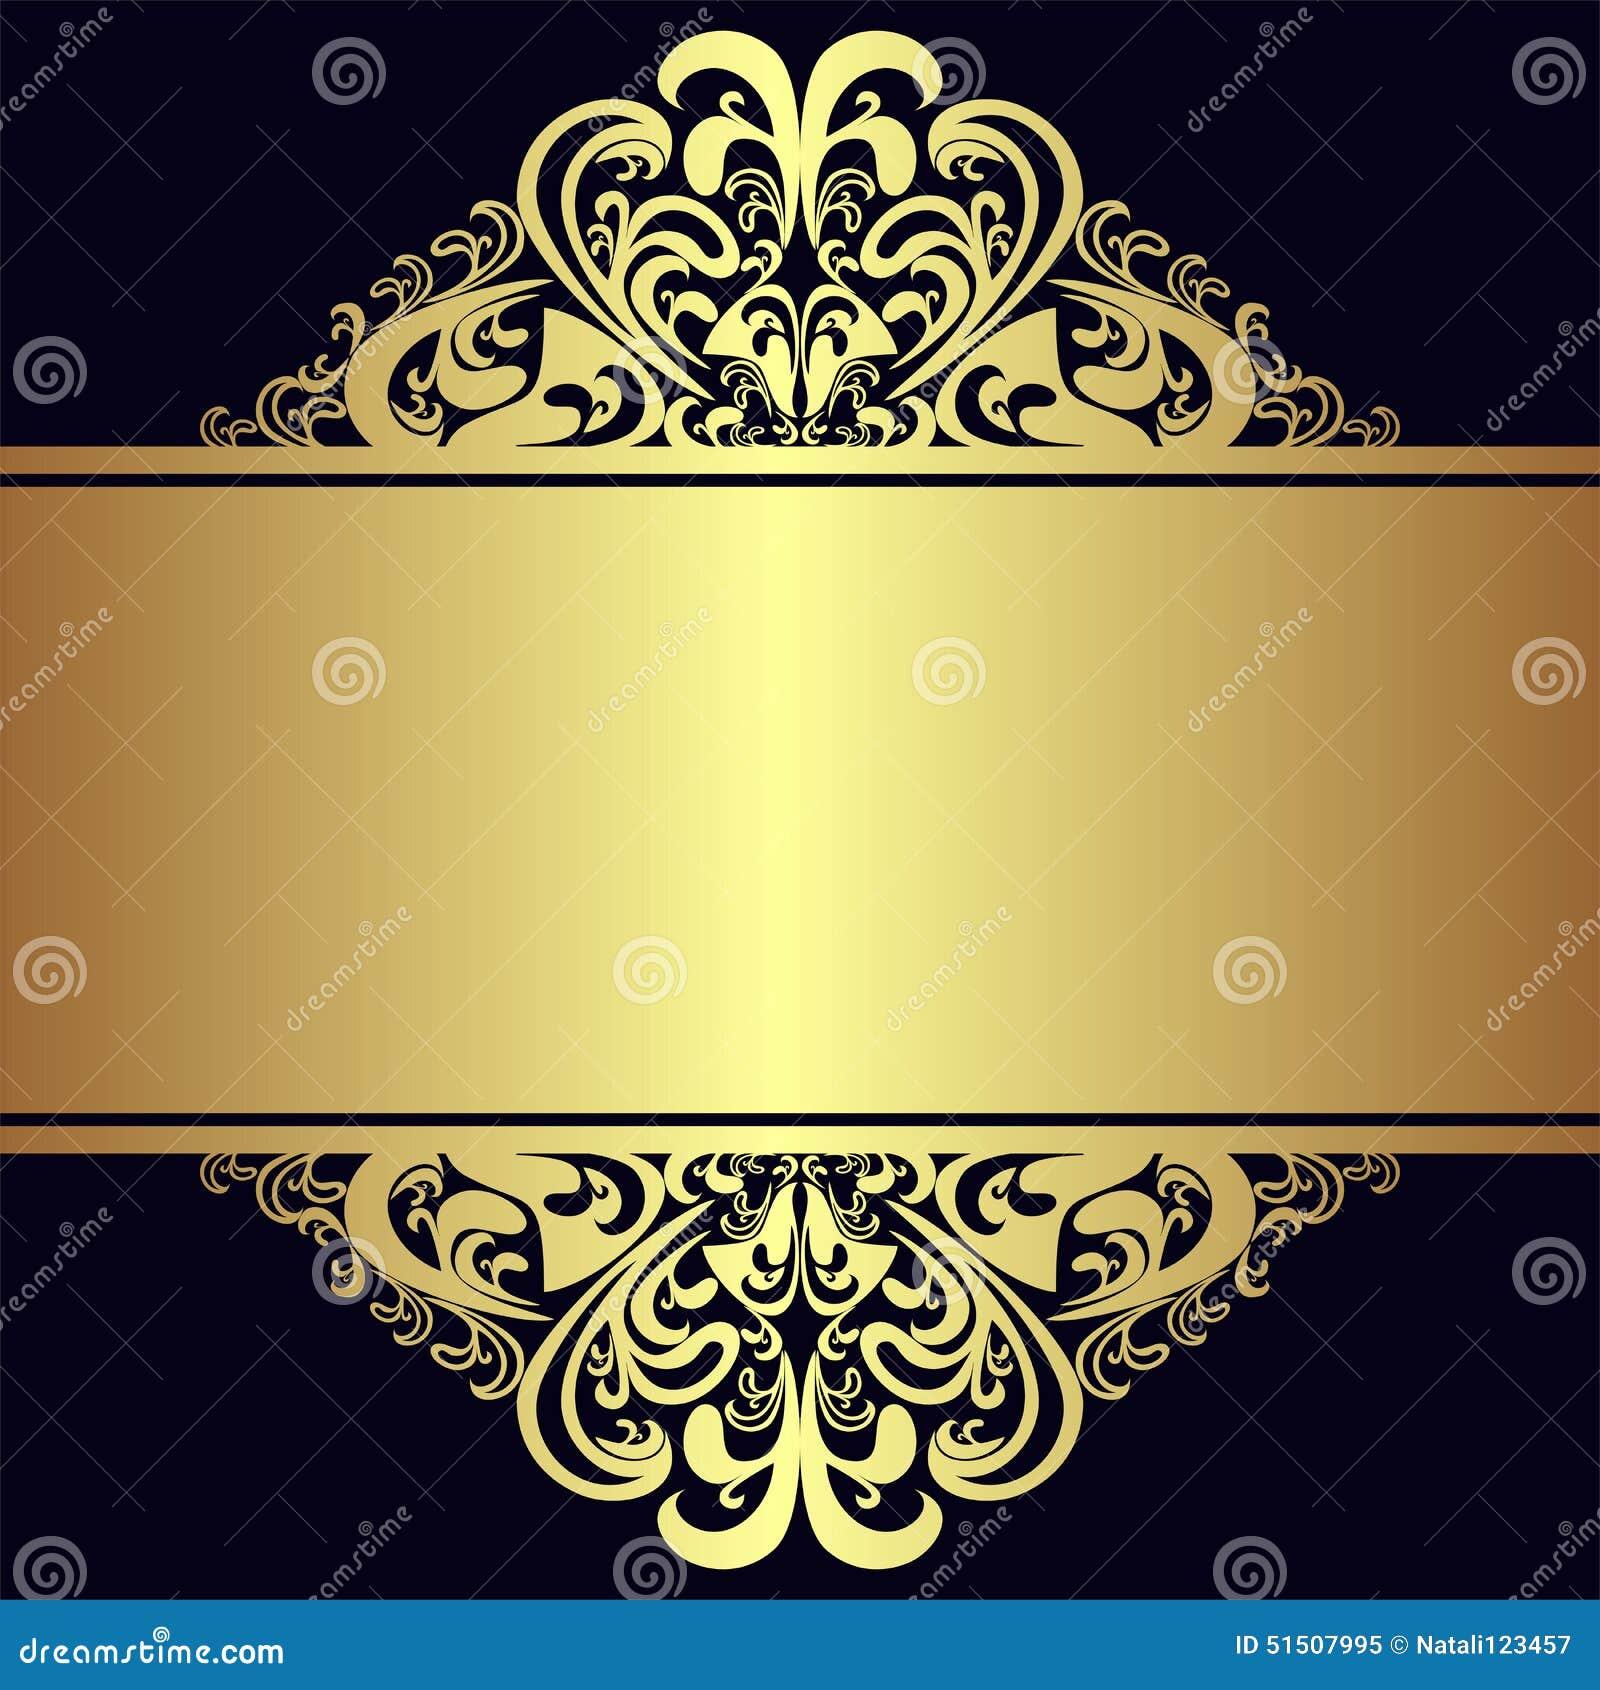 Gold corner swirl